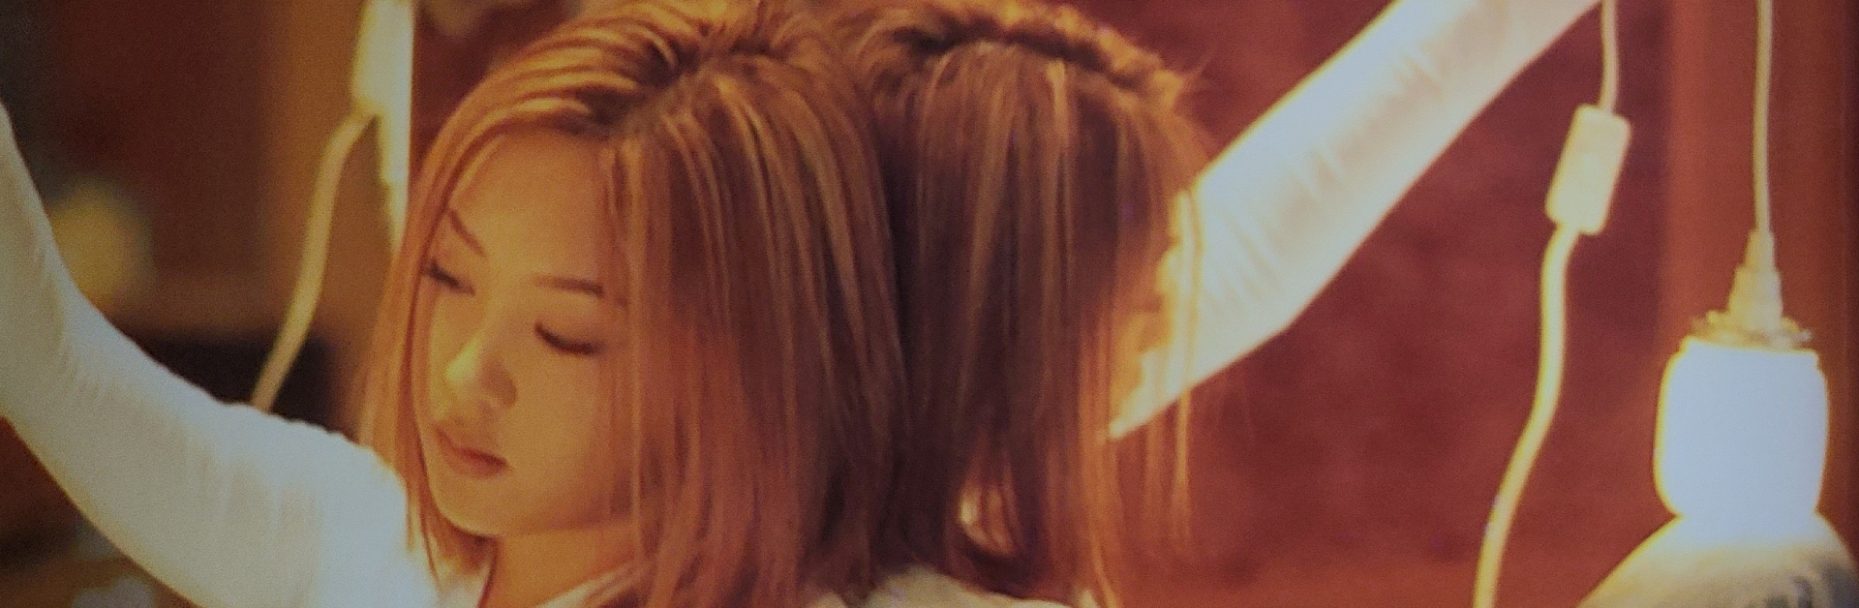 "Image from J ""I.N.L.O.V.E."" album"